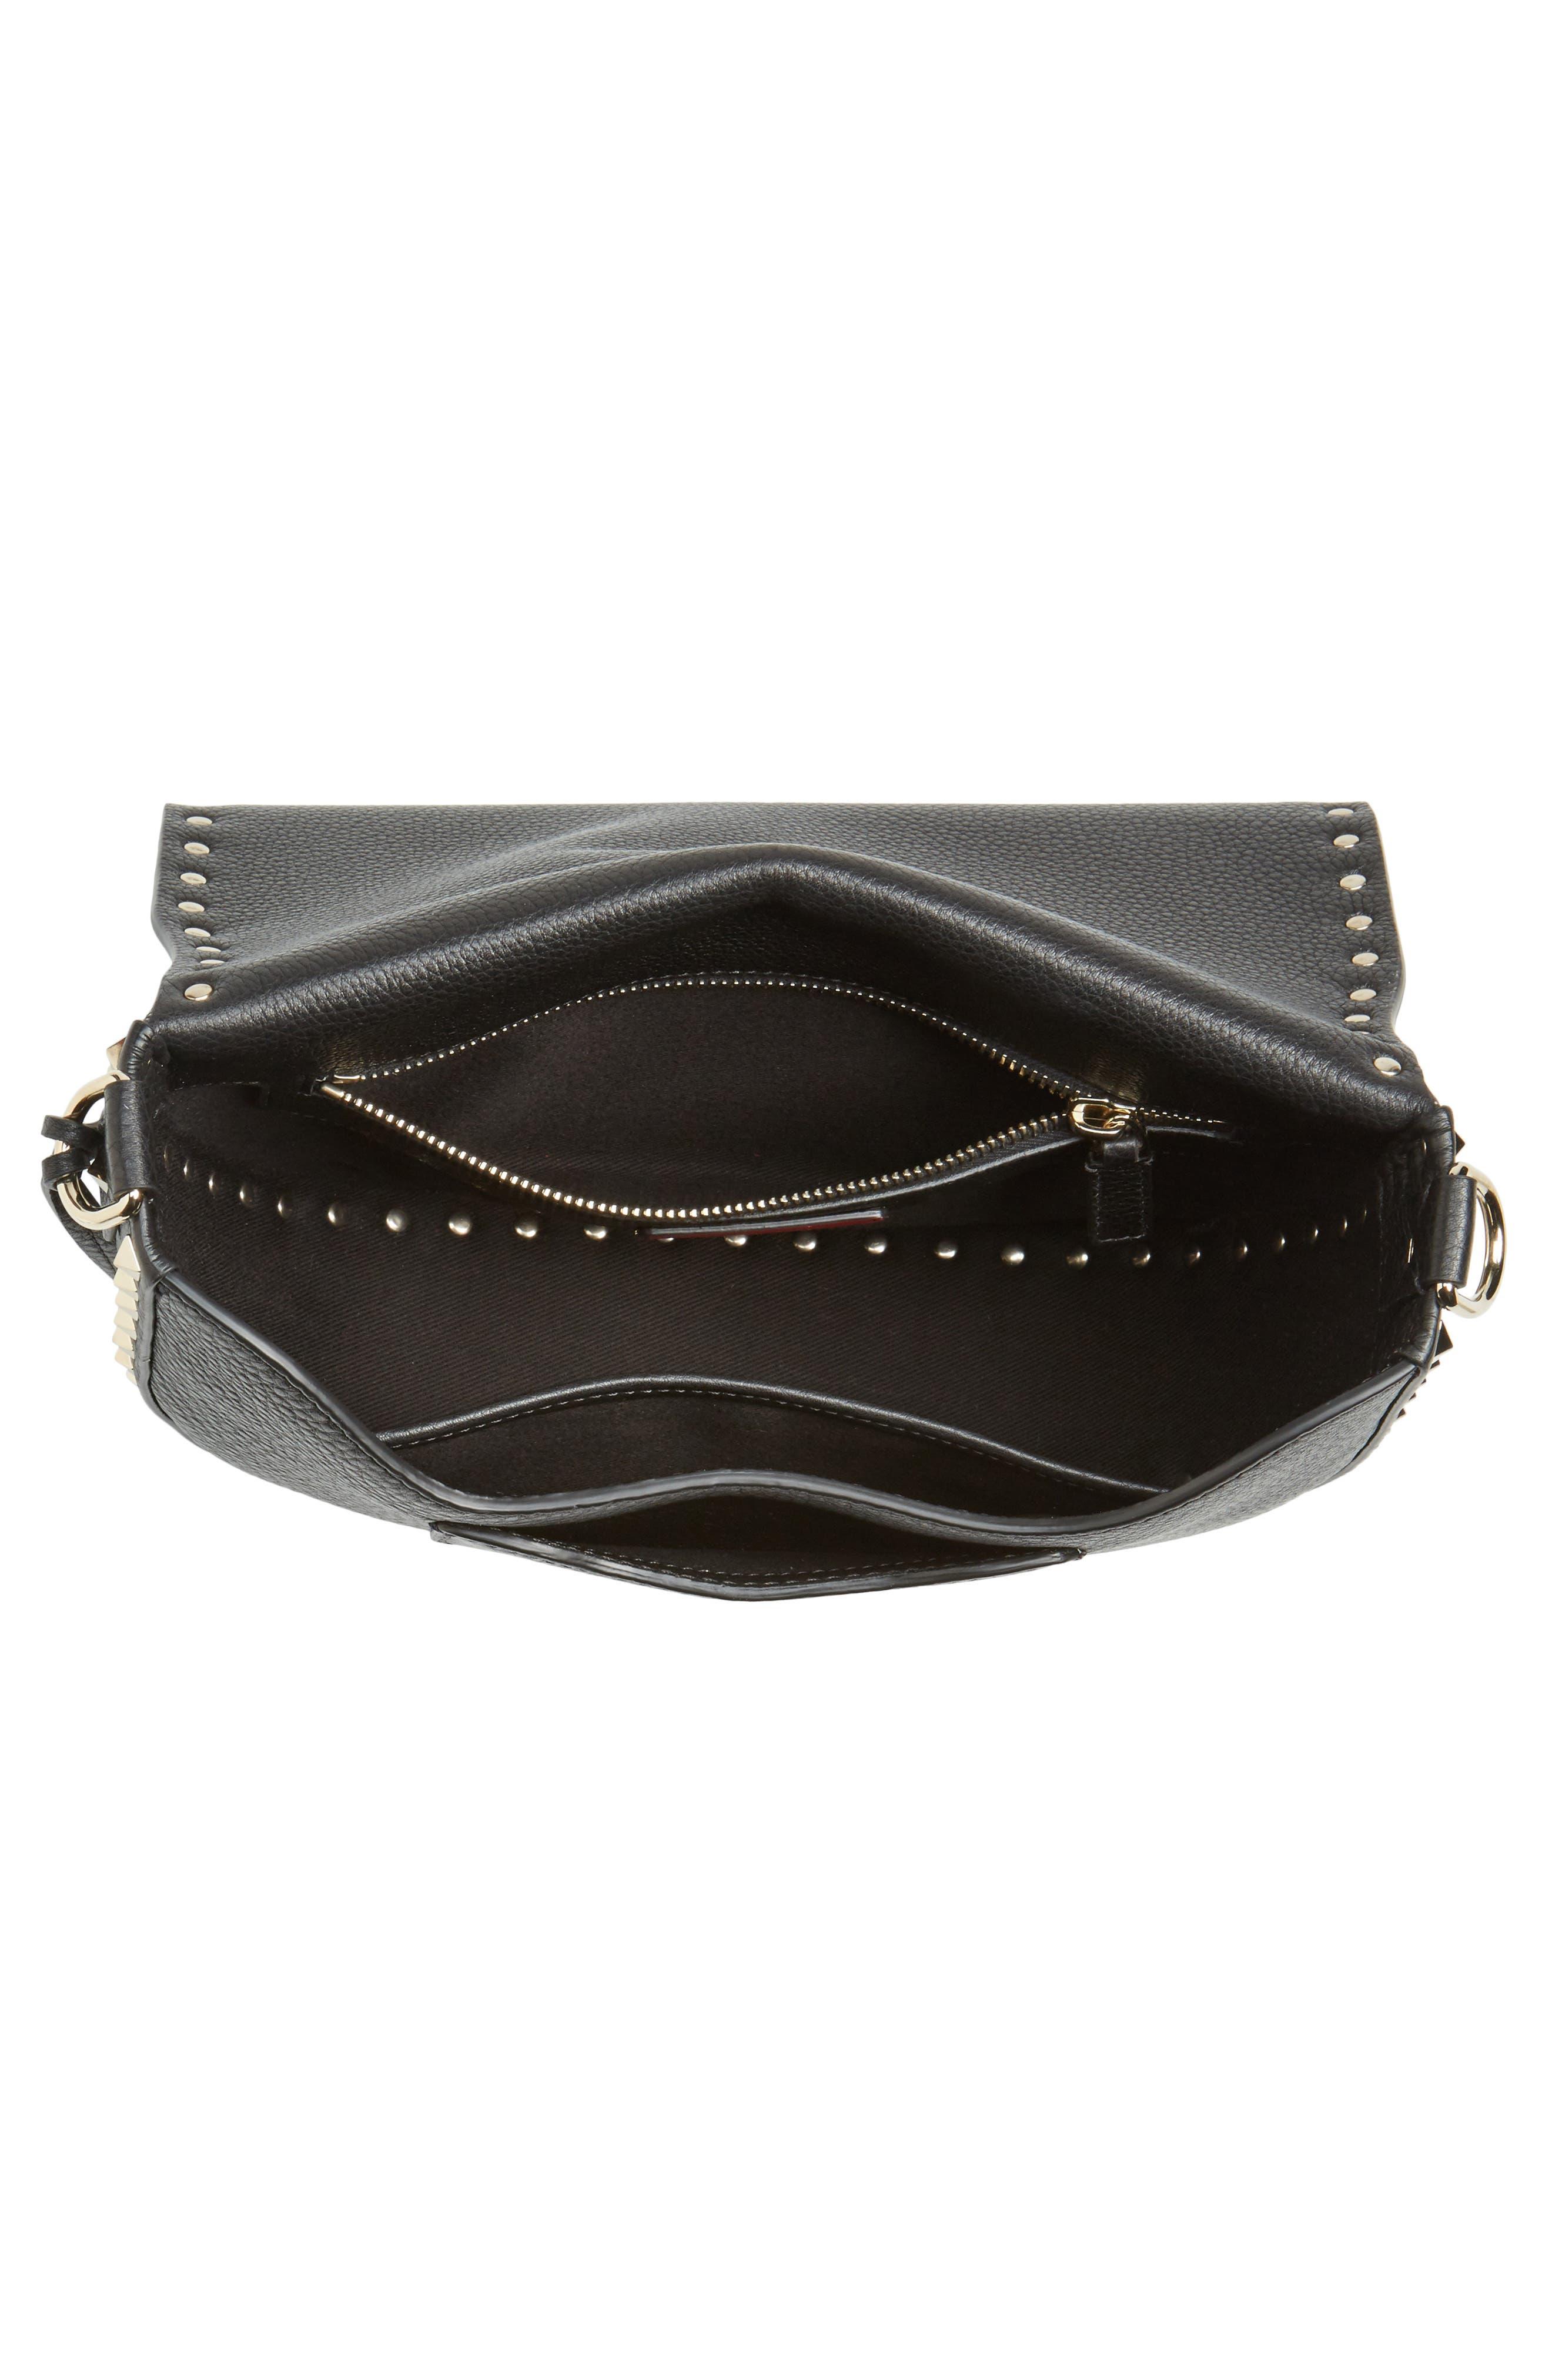 Rockstud Leather Saddle Bag,                             Alternate thumbnail 6, color,                             Black